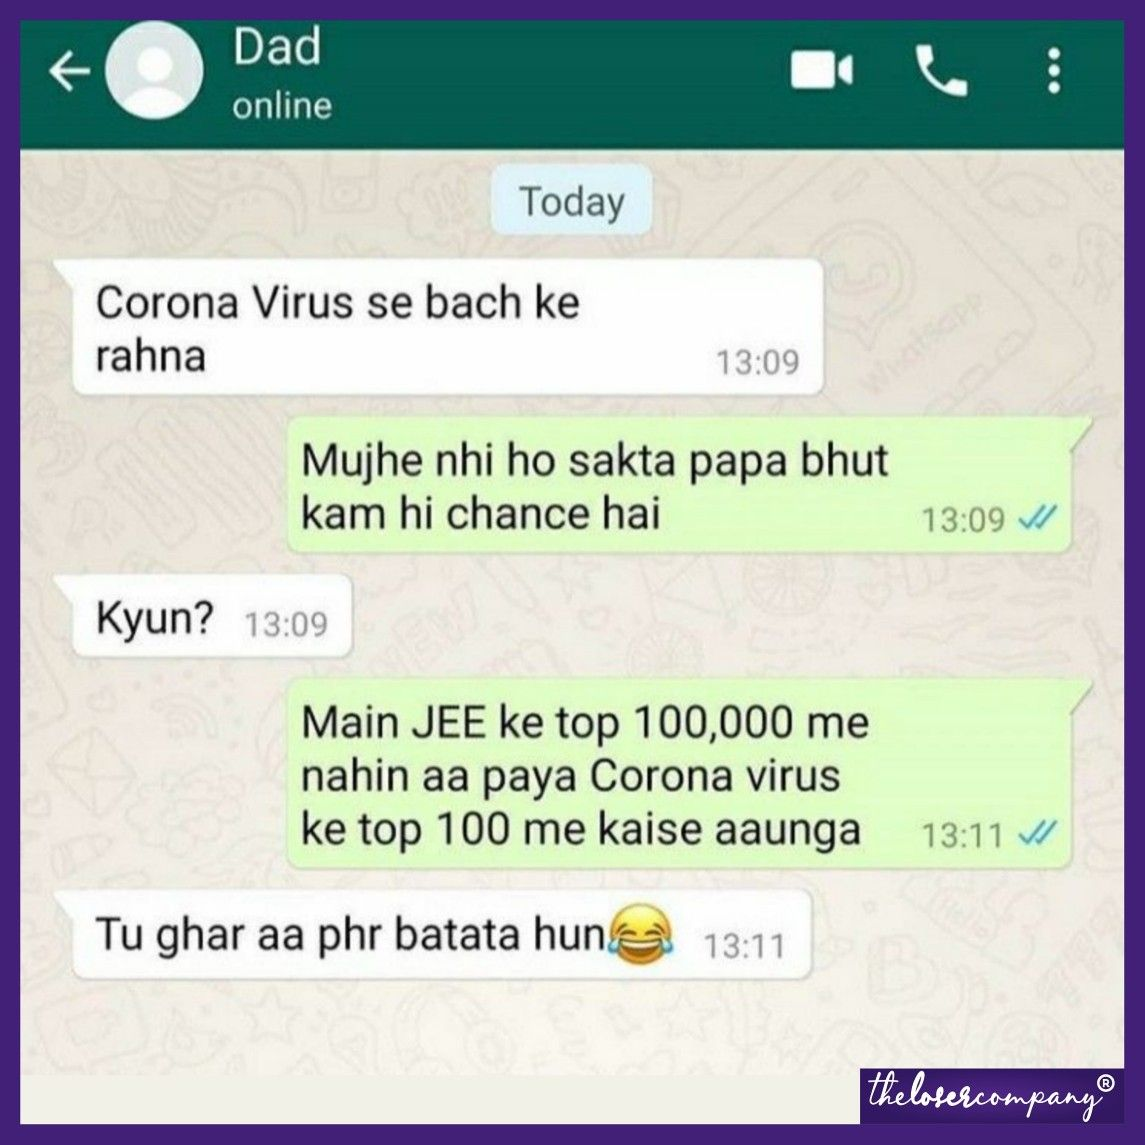 Main Bhi Bach Gaya Fir Toh In 2020 Fun Quotes Funny Crazy Funny Memes Stupid Funny Memes